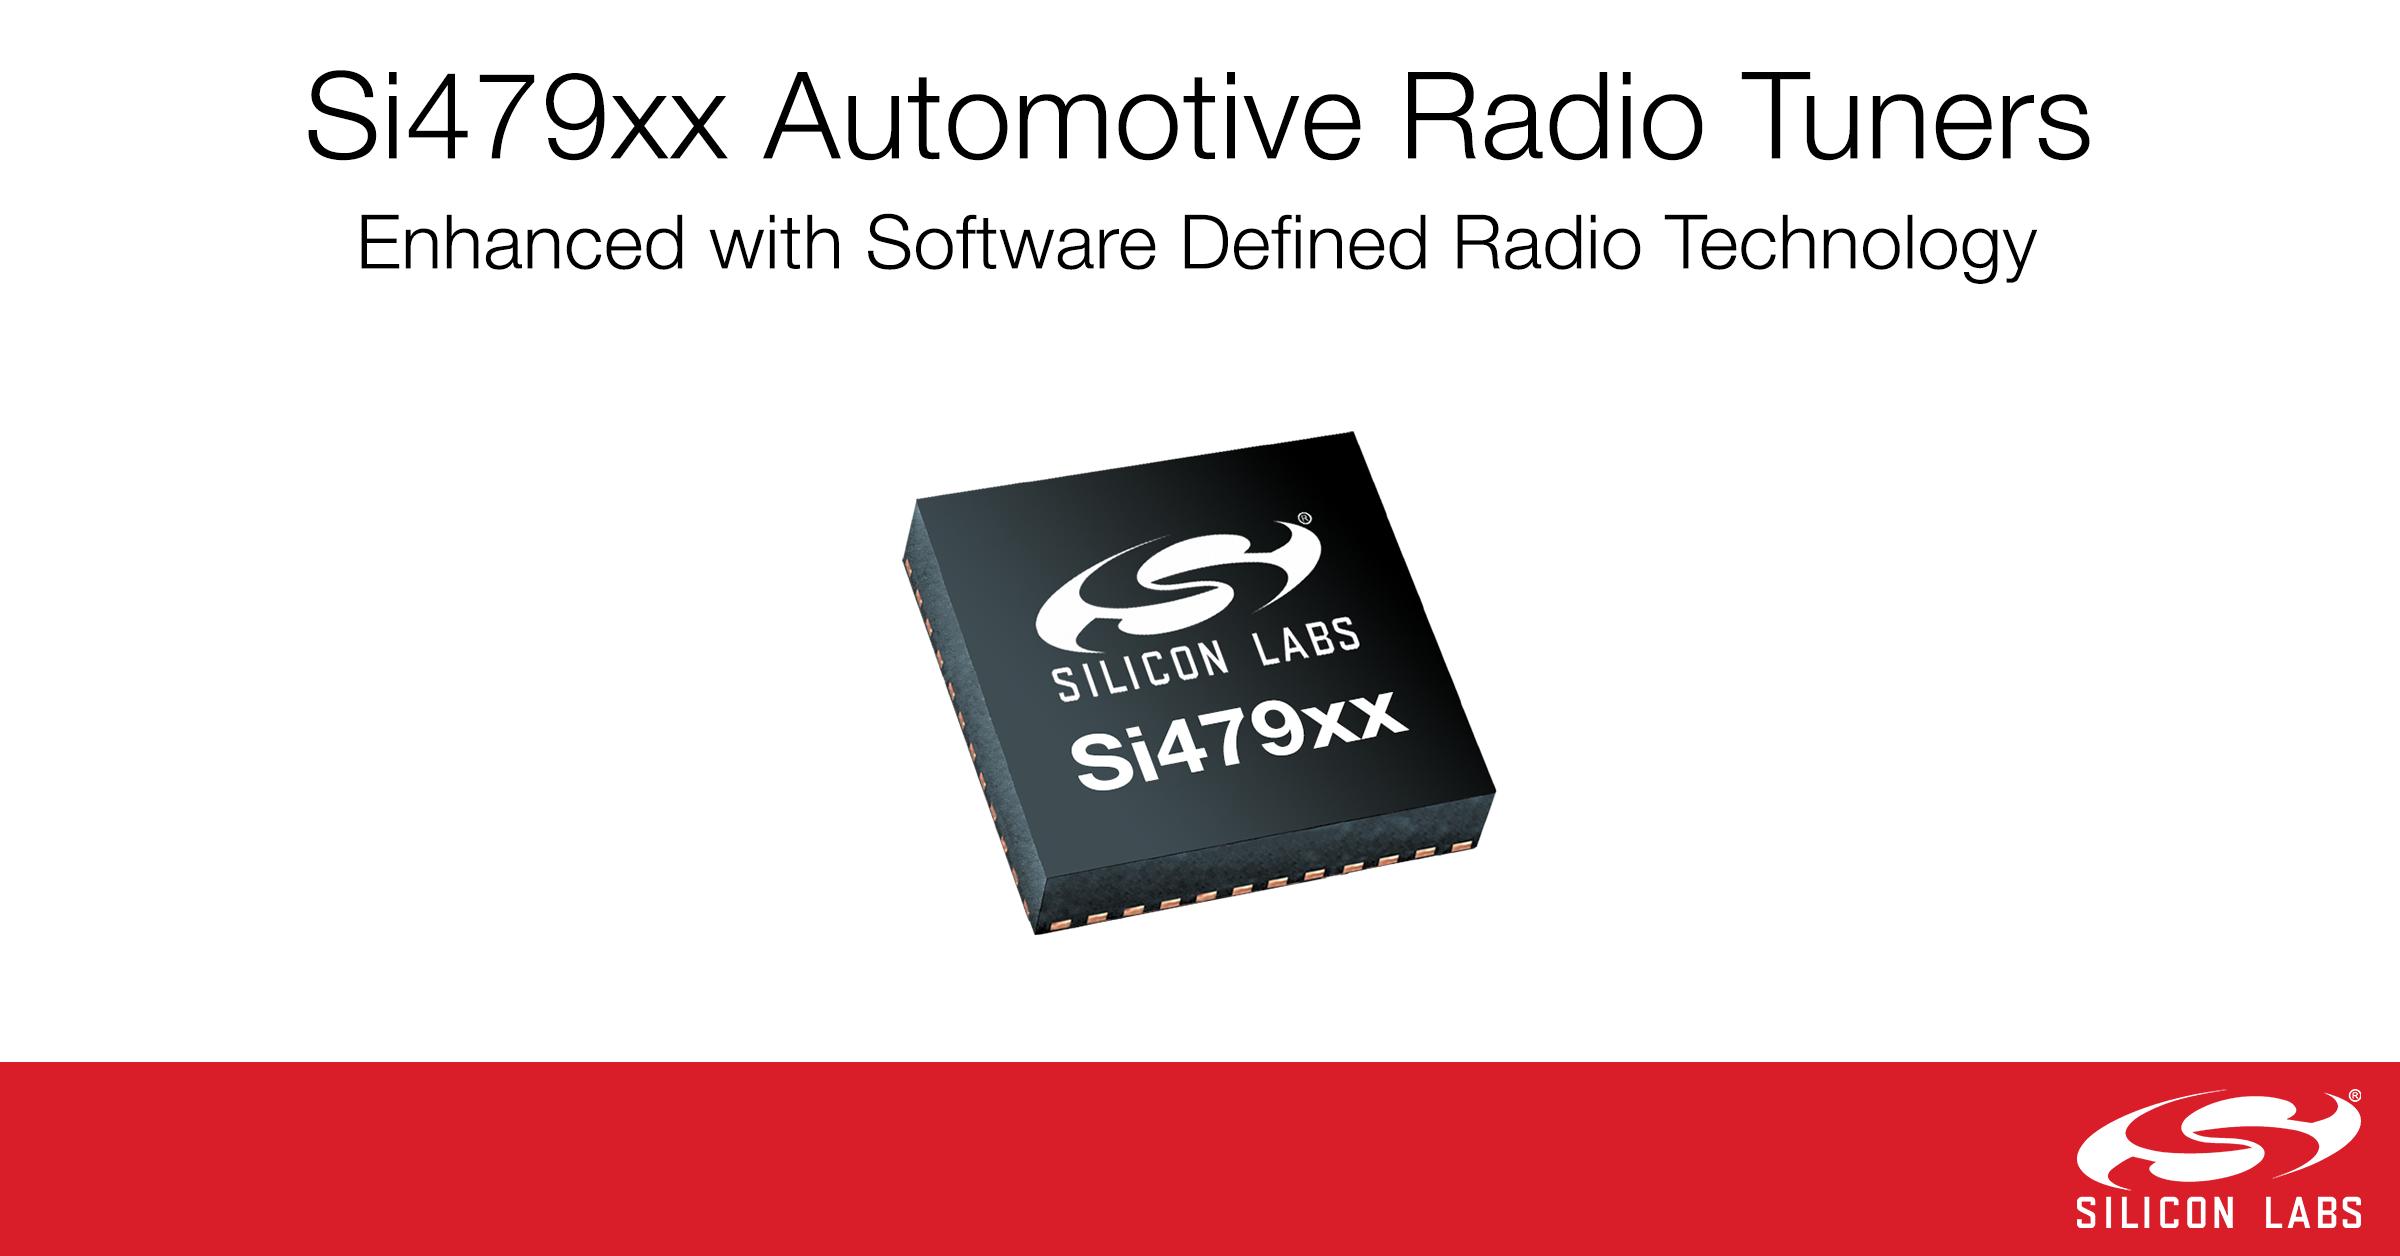 Silicon Labs利用软件定义无线电技术 提升广受欢迎的Si479xx汽车调谐器系列产品